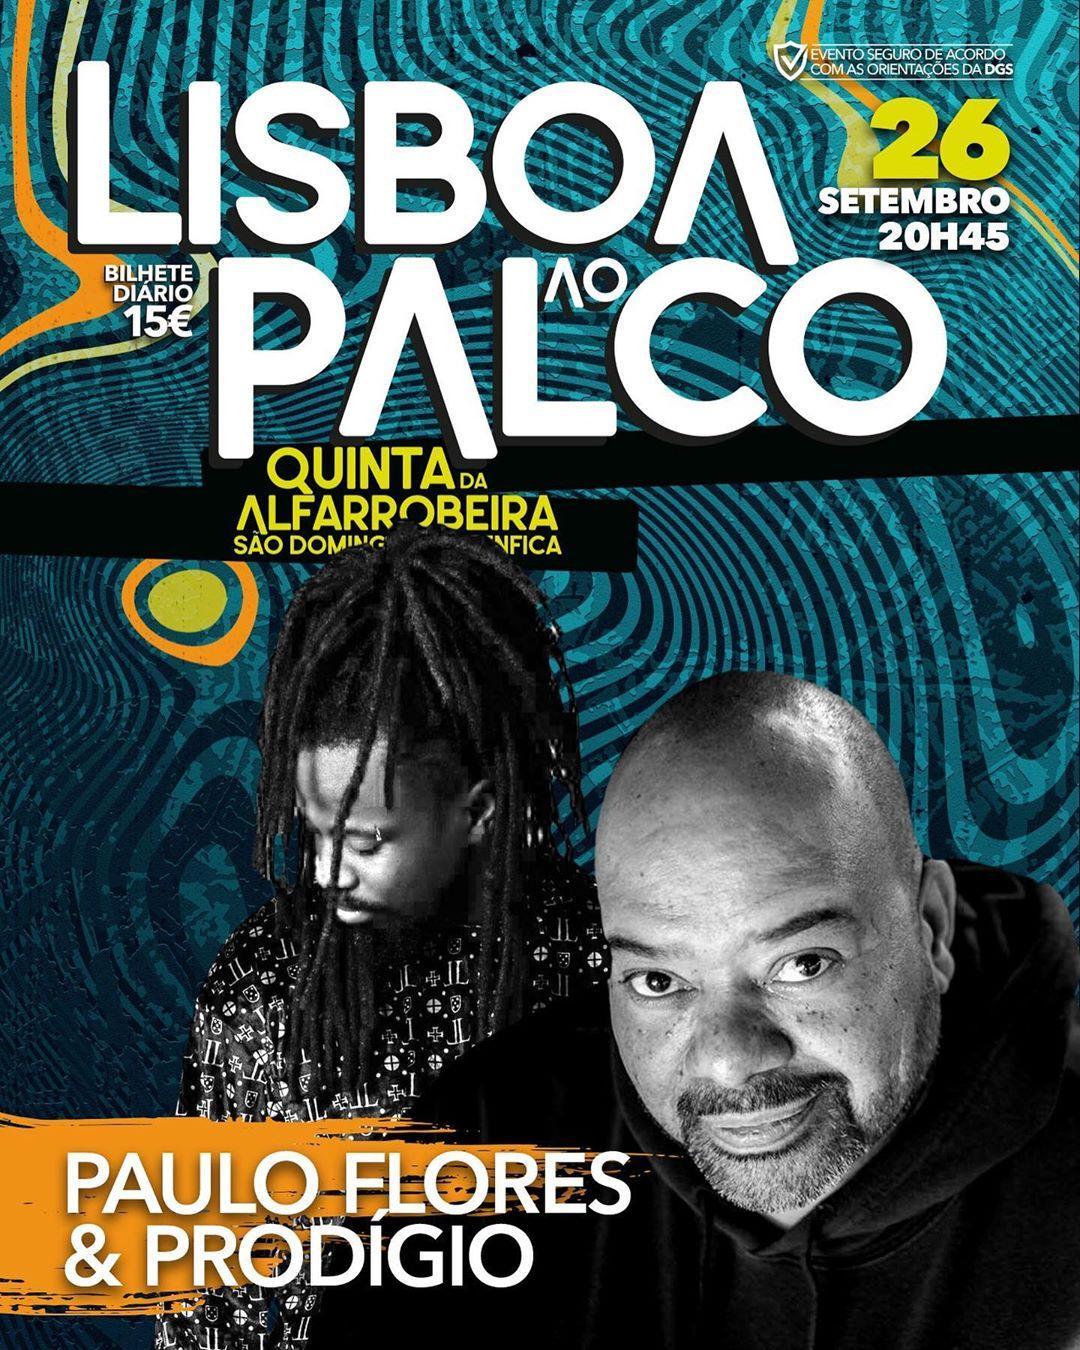 Prodígio e Paulo Flores marcam espectáculo de reabertura dos palcos portugueses